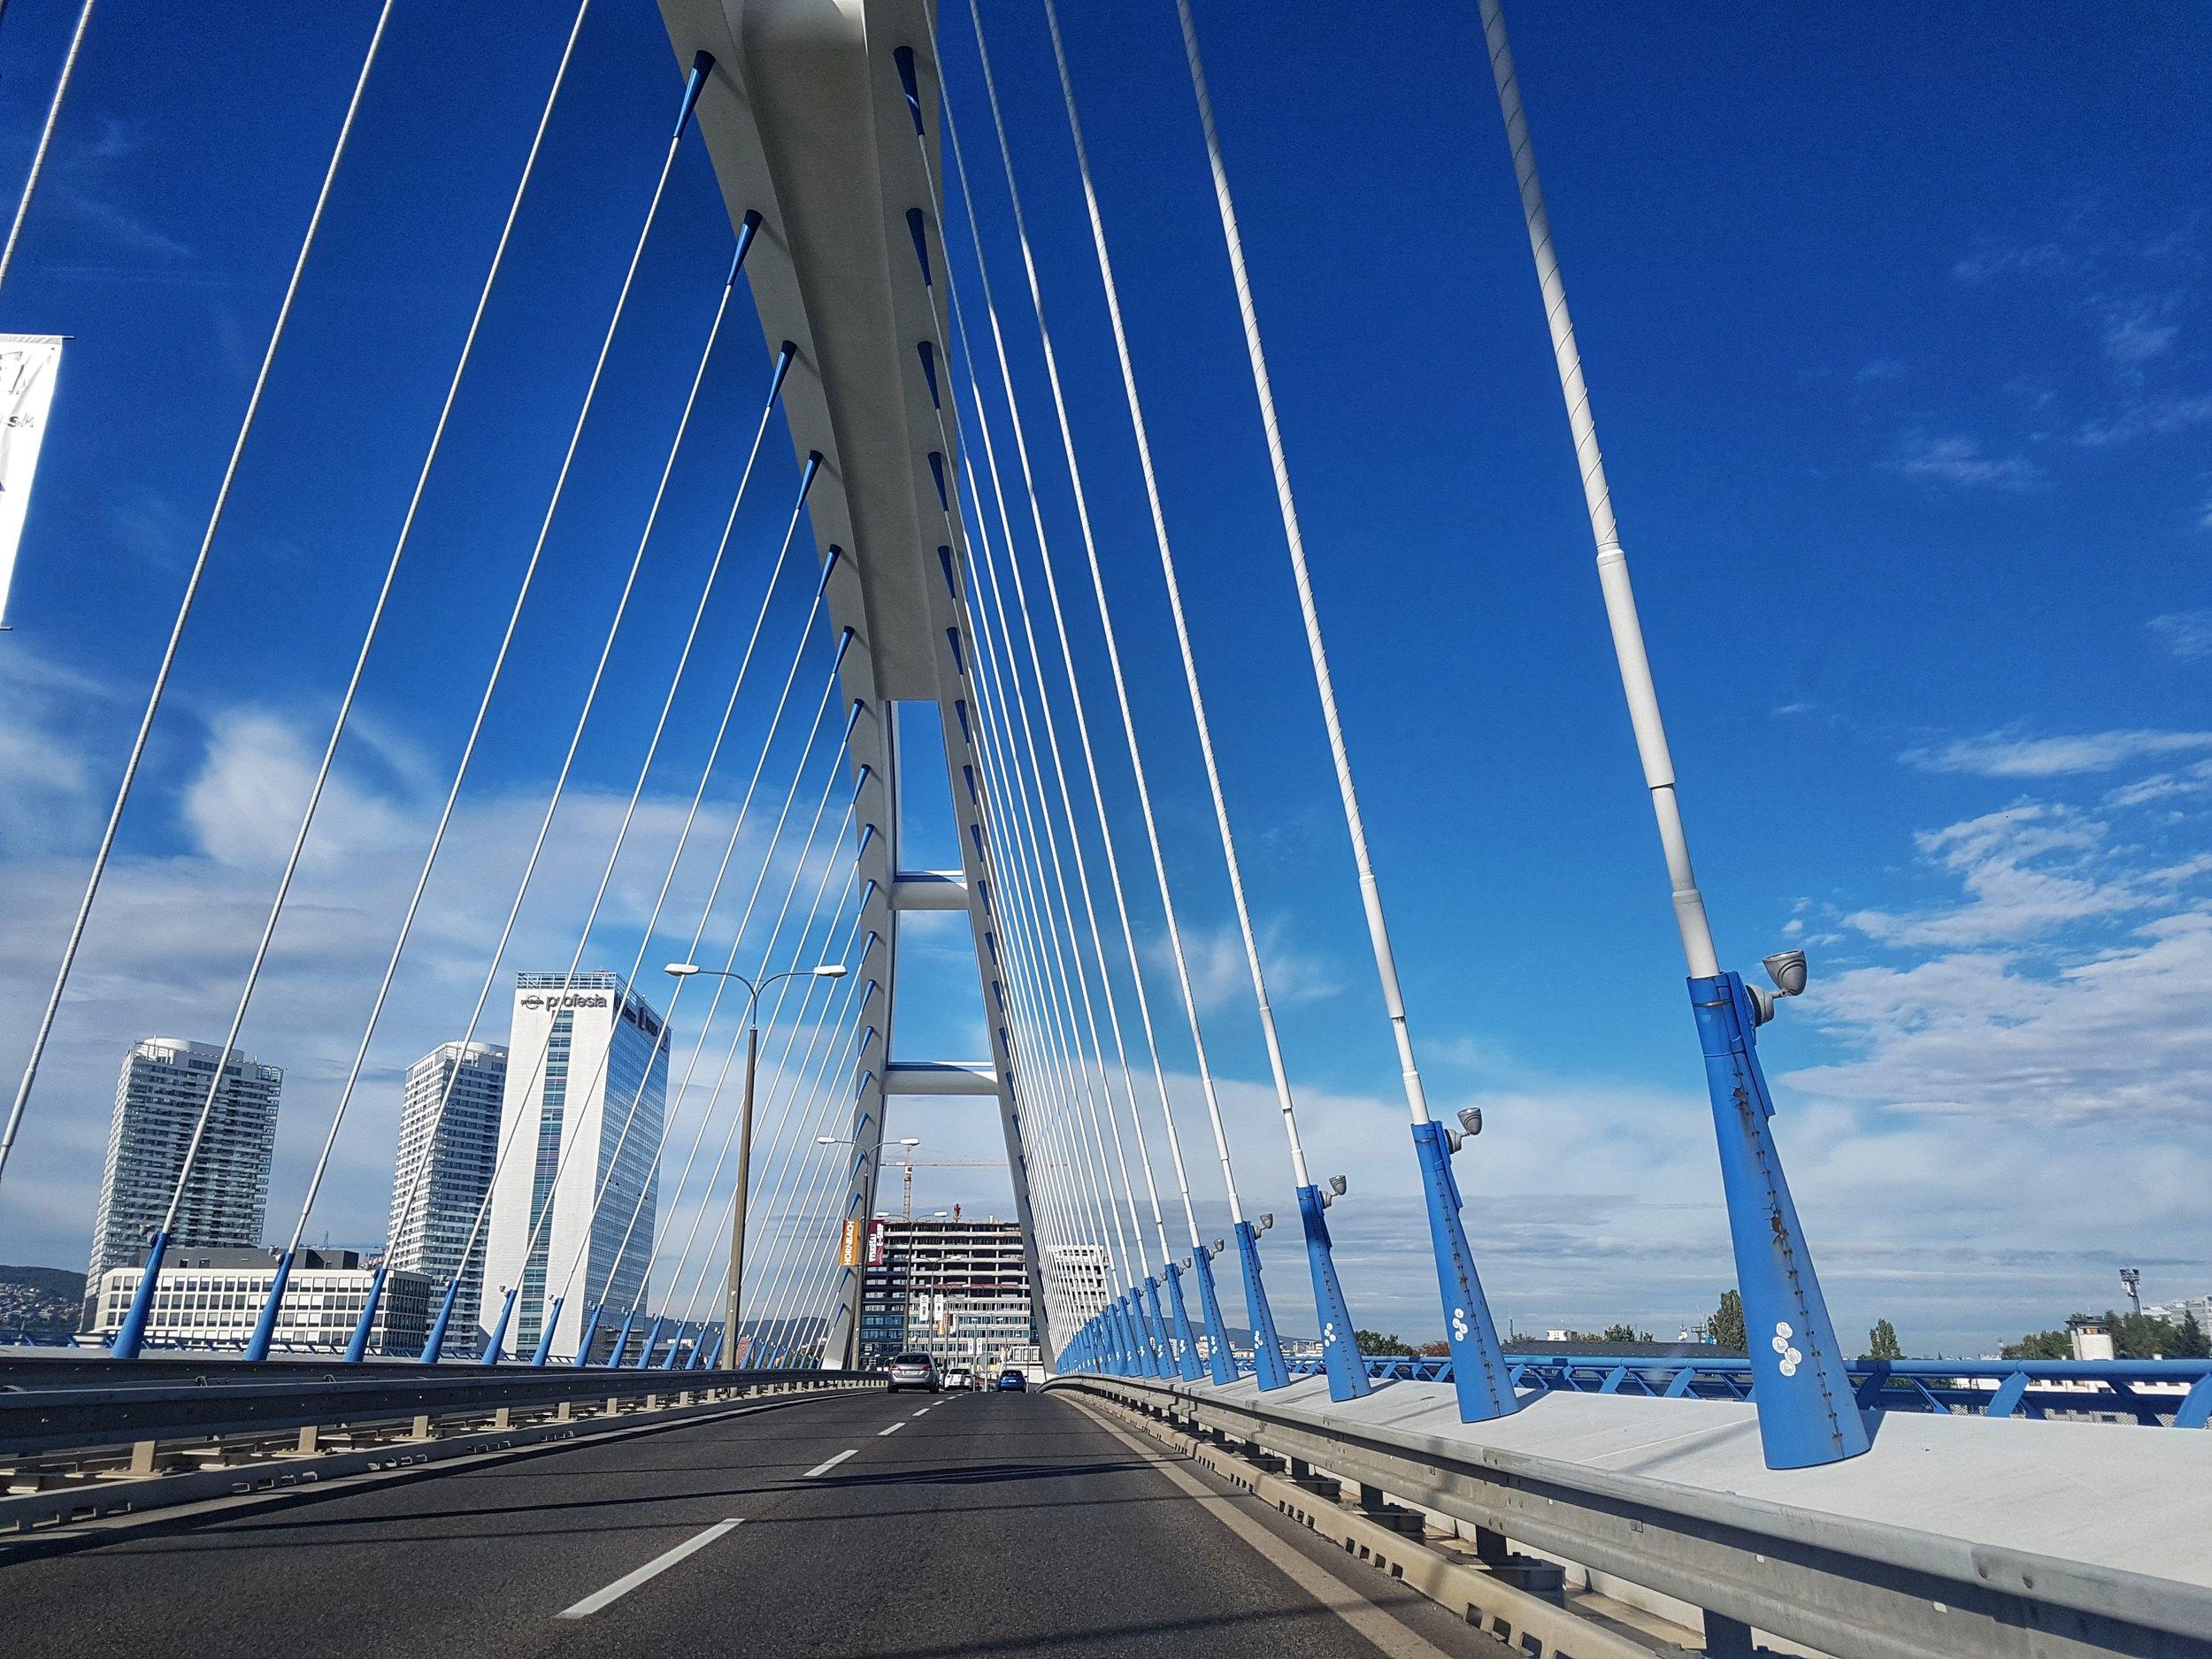 Bratislava, First destination